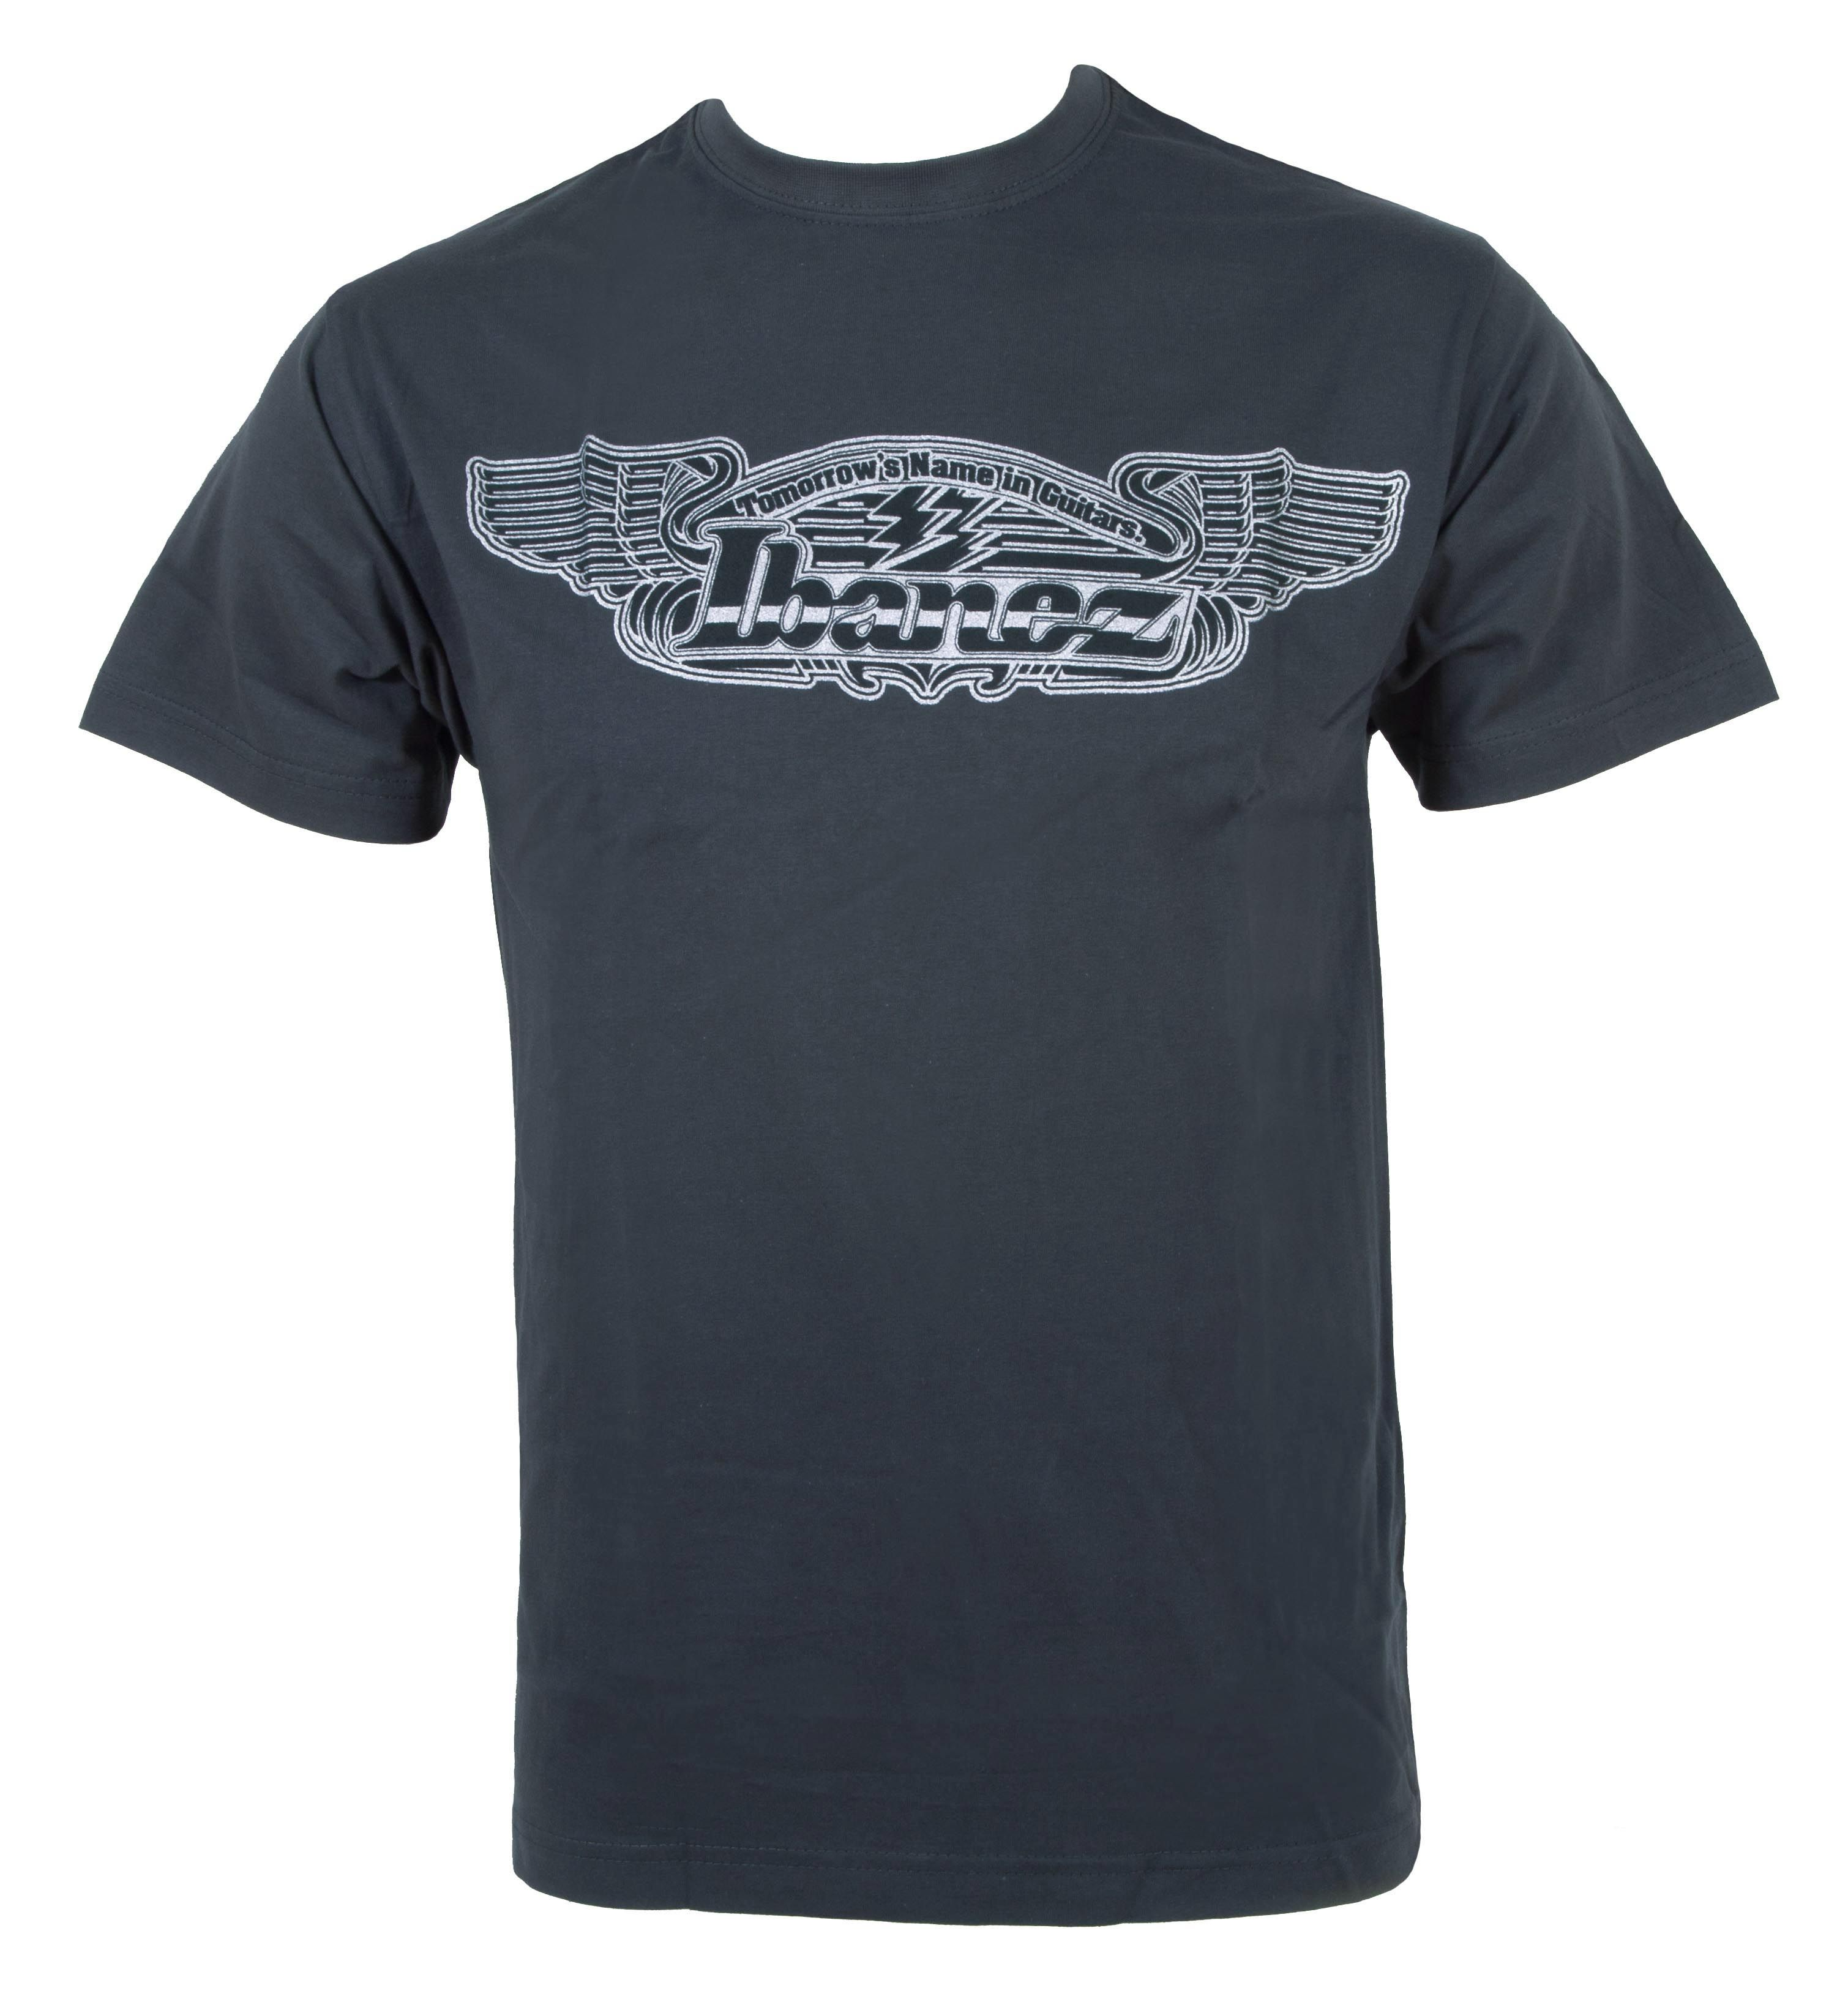 Ibanez, Ibanez Merchandise, Merchandise, Ibanez T-Shirt, T-Shirt, Meinlshop, Meinl Shop, Modellnummer: IT209